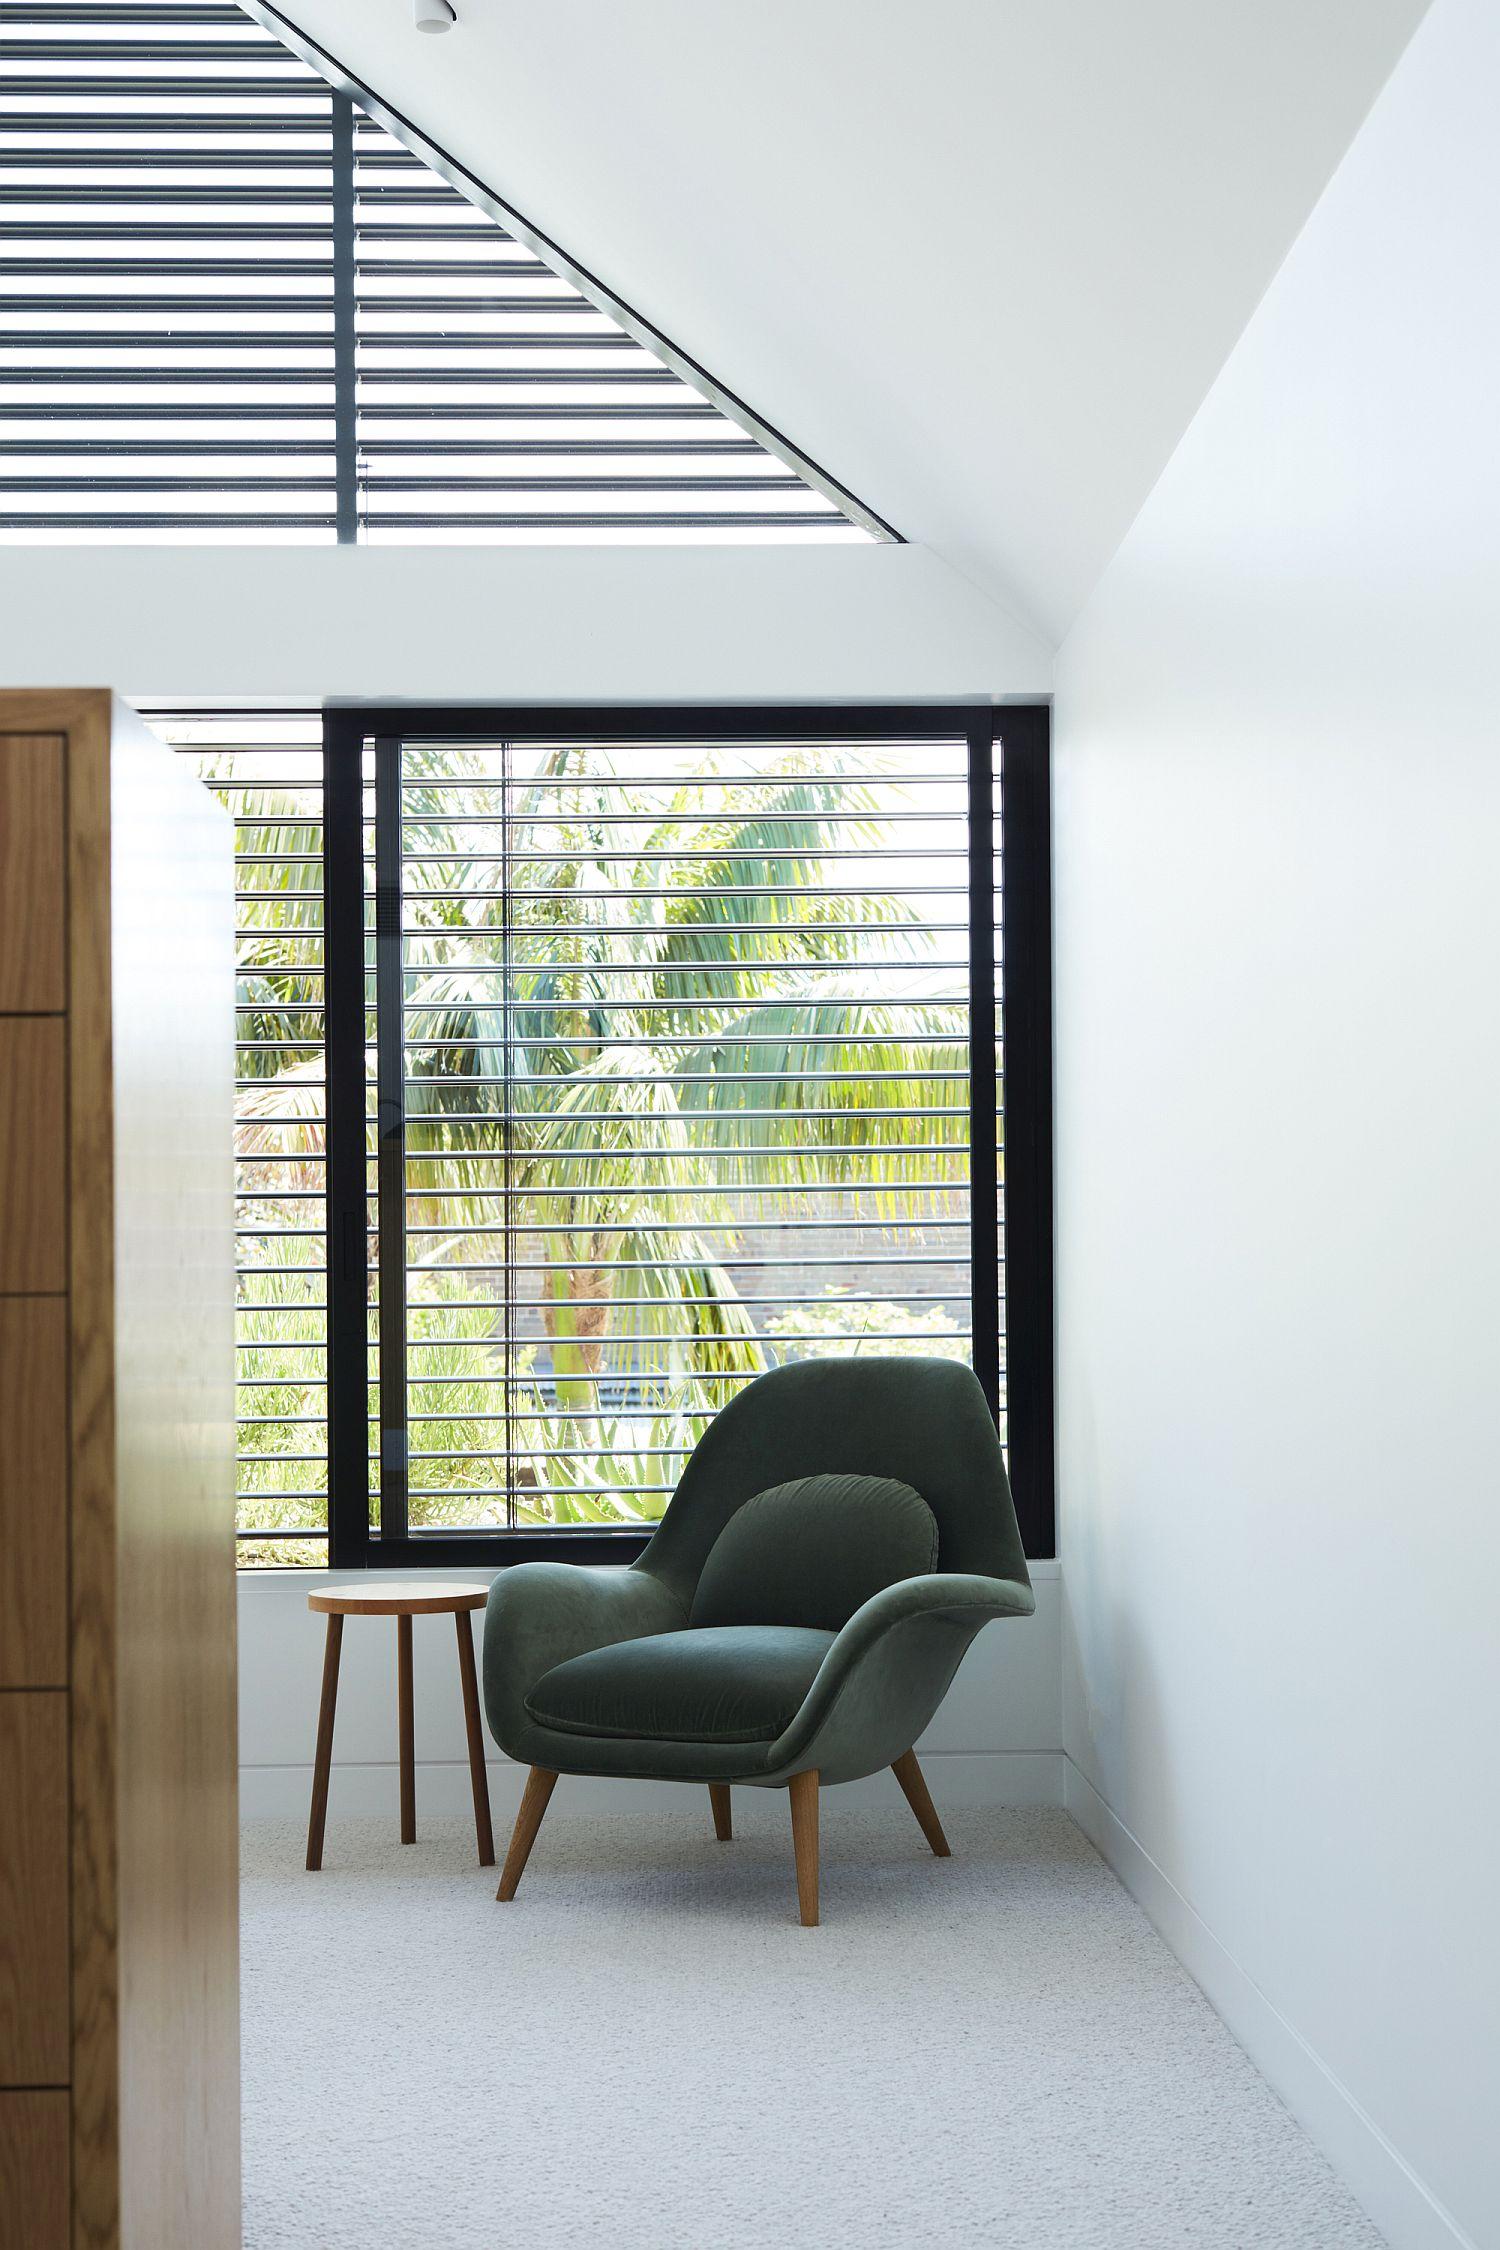 Dark window frames and slats anchor the white room beautifully